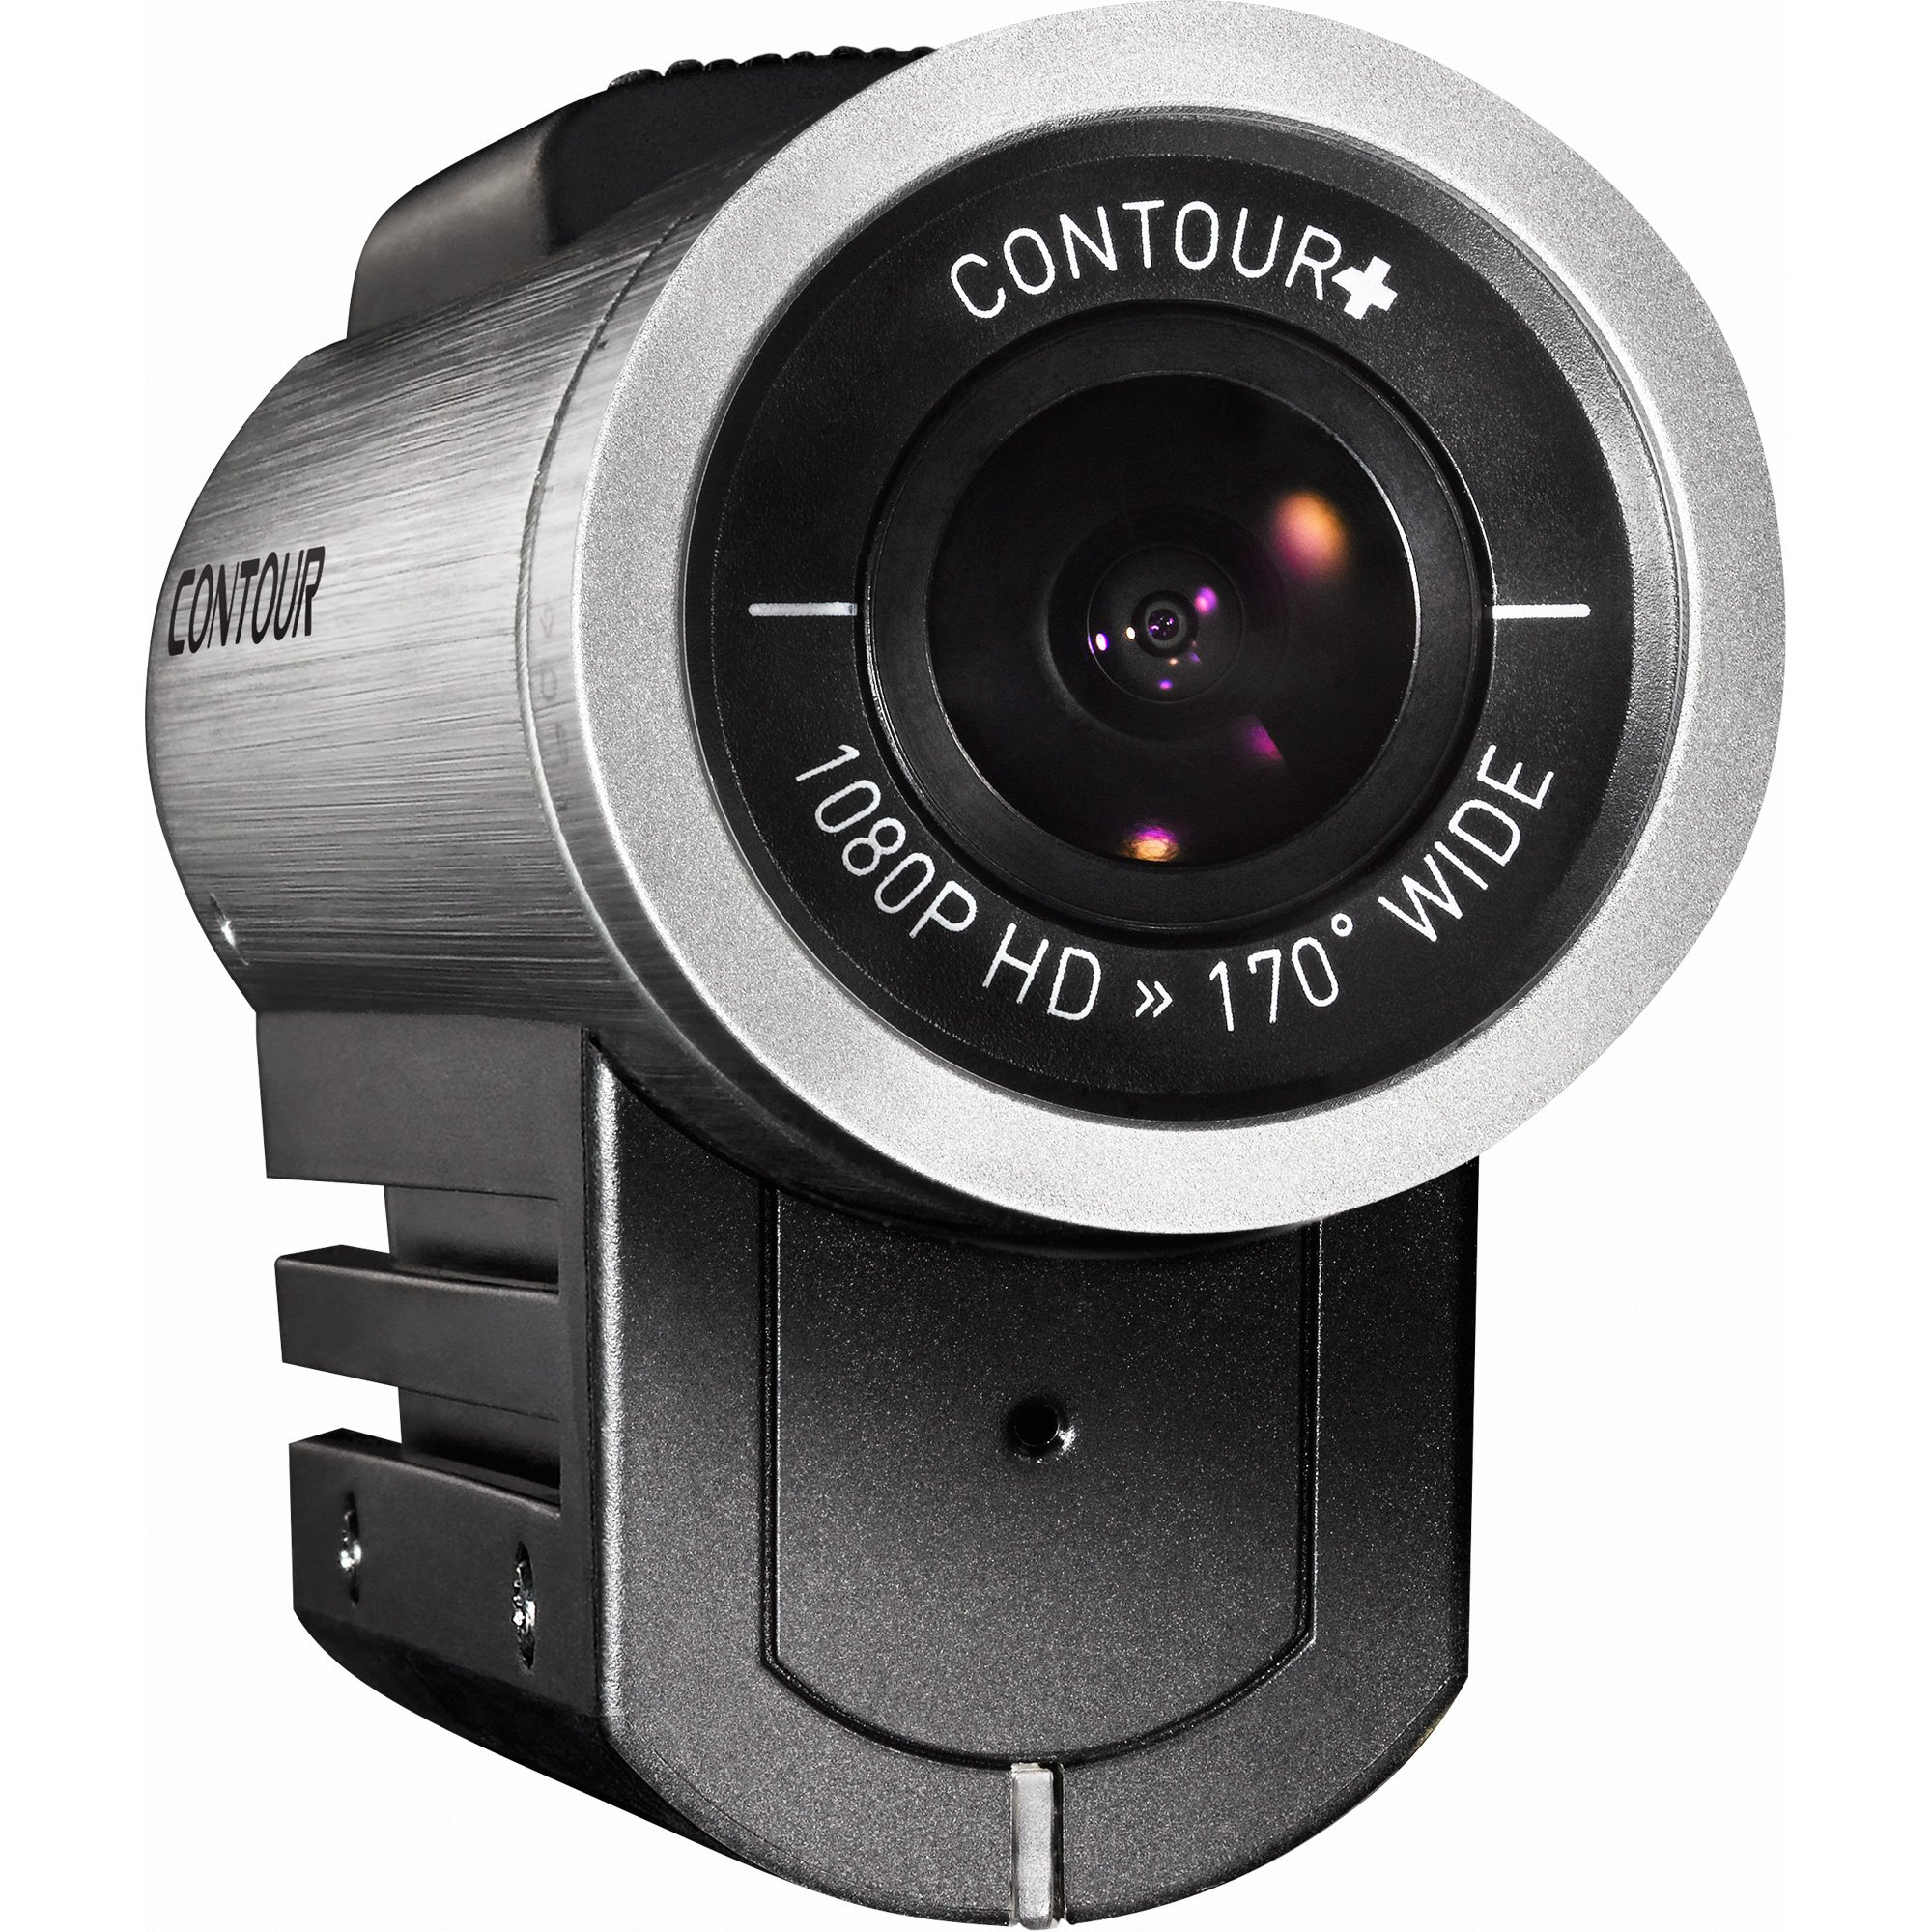 Contour+ Plus Camera by Contour